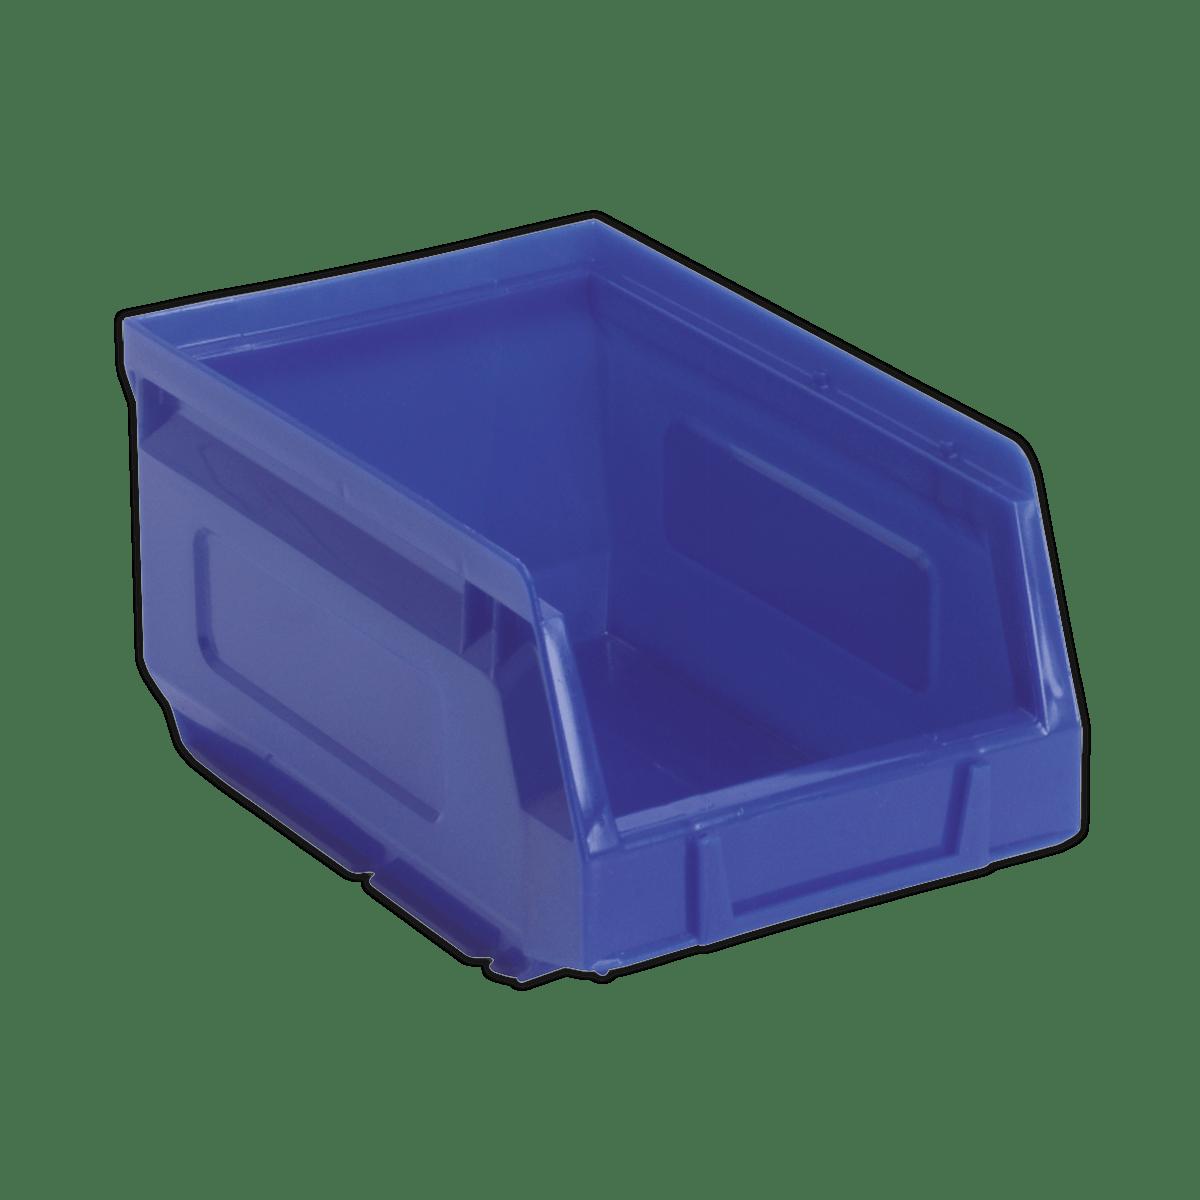 Sealey Plastic Storage Bin 105 x 165 x 85mm - Blue Pack of 48 TPS2